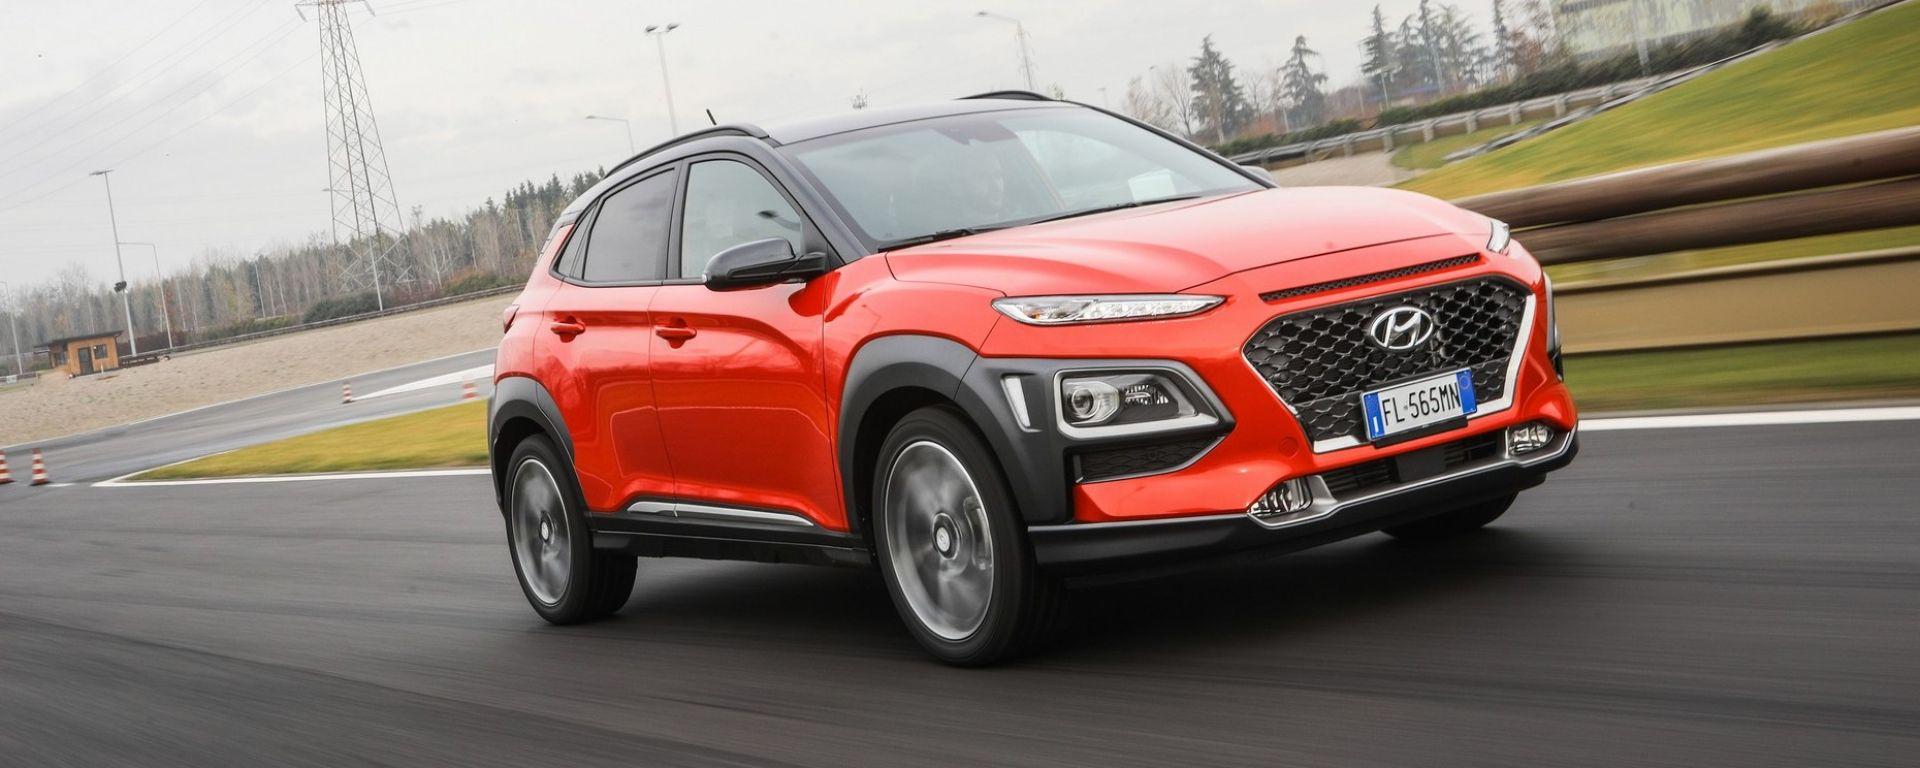 Nuova Hyundai Kona 2018